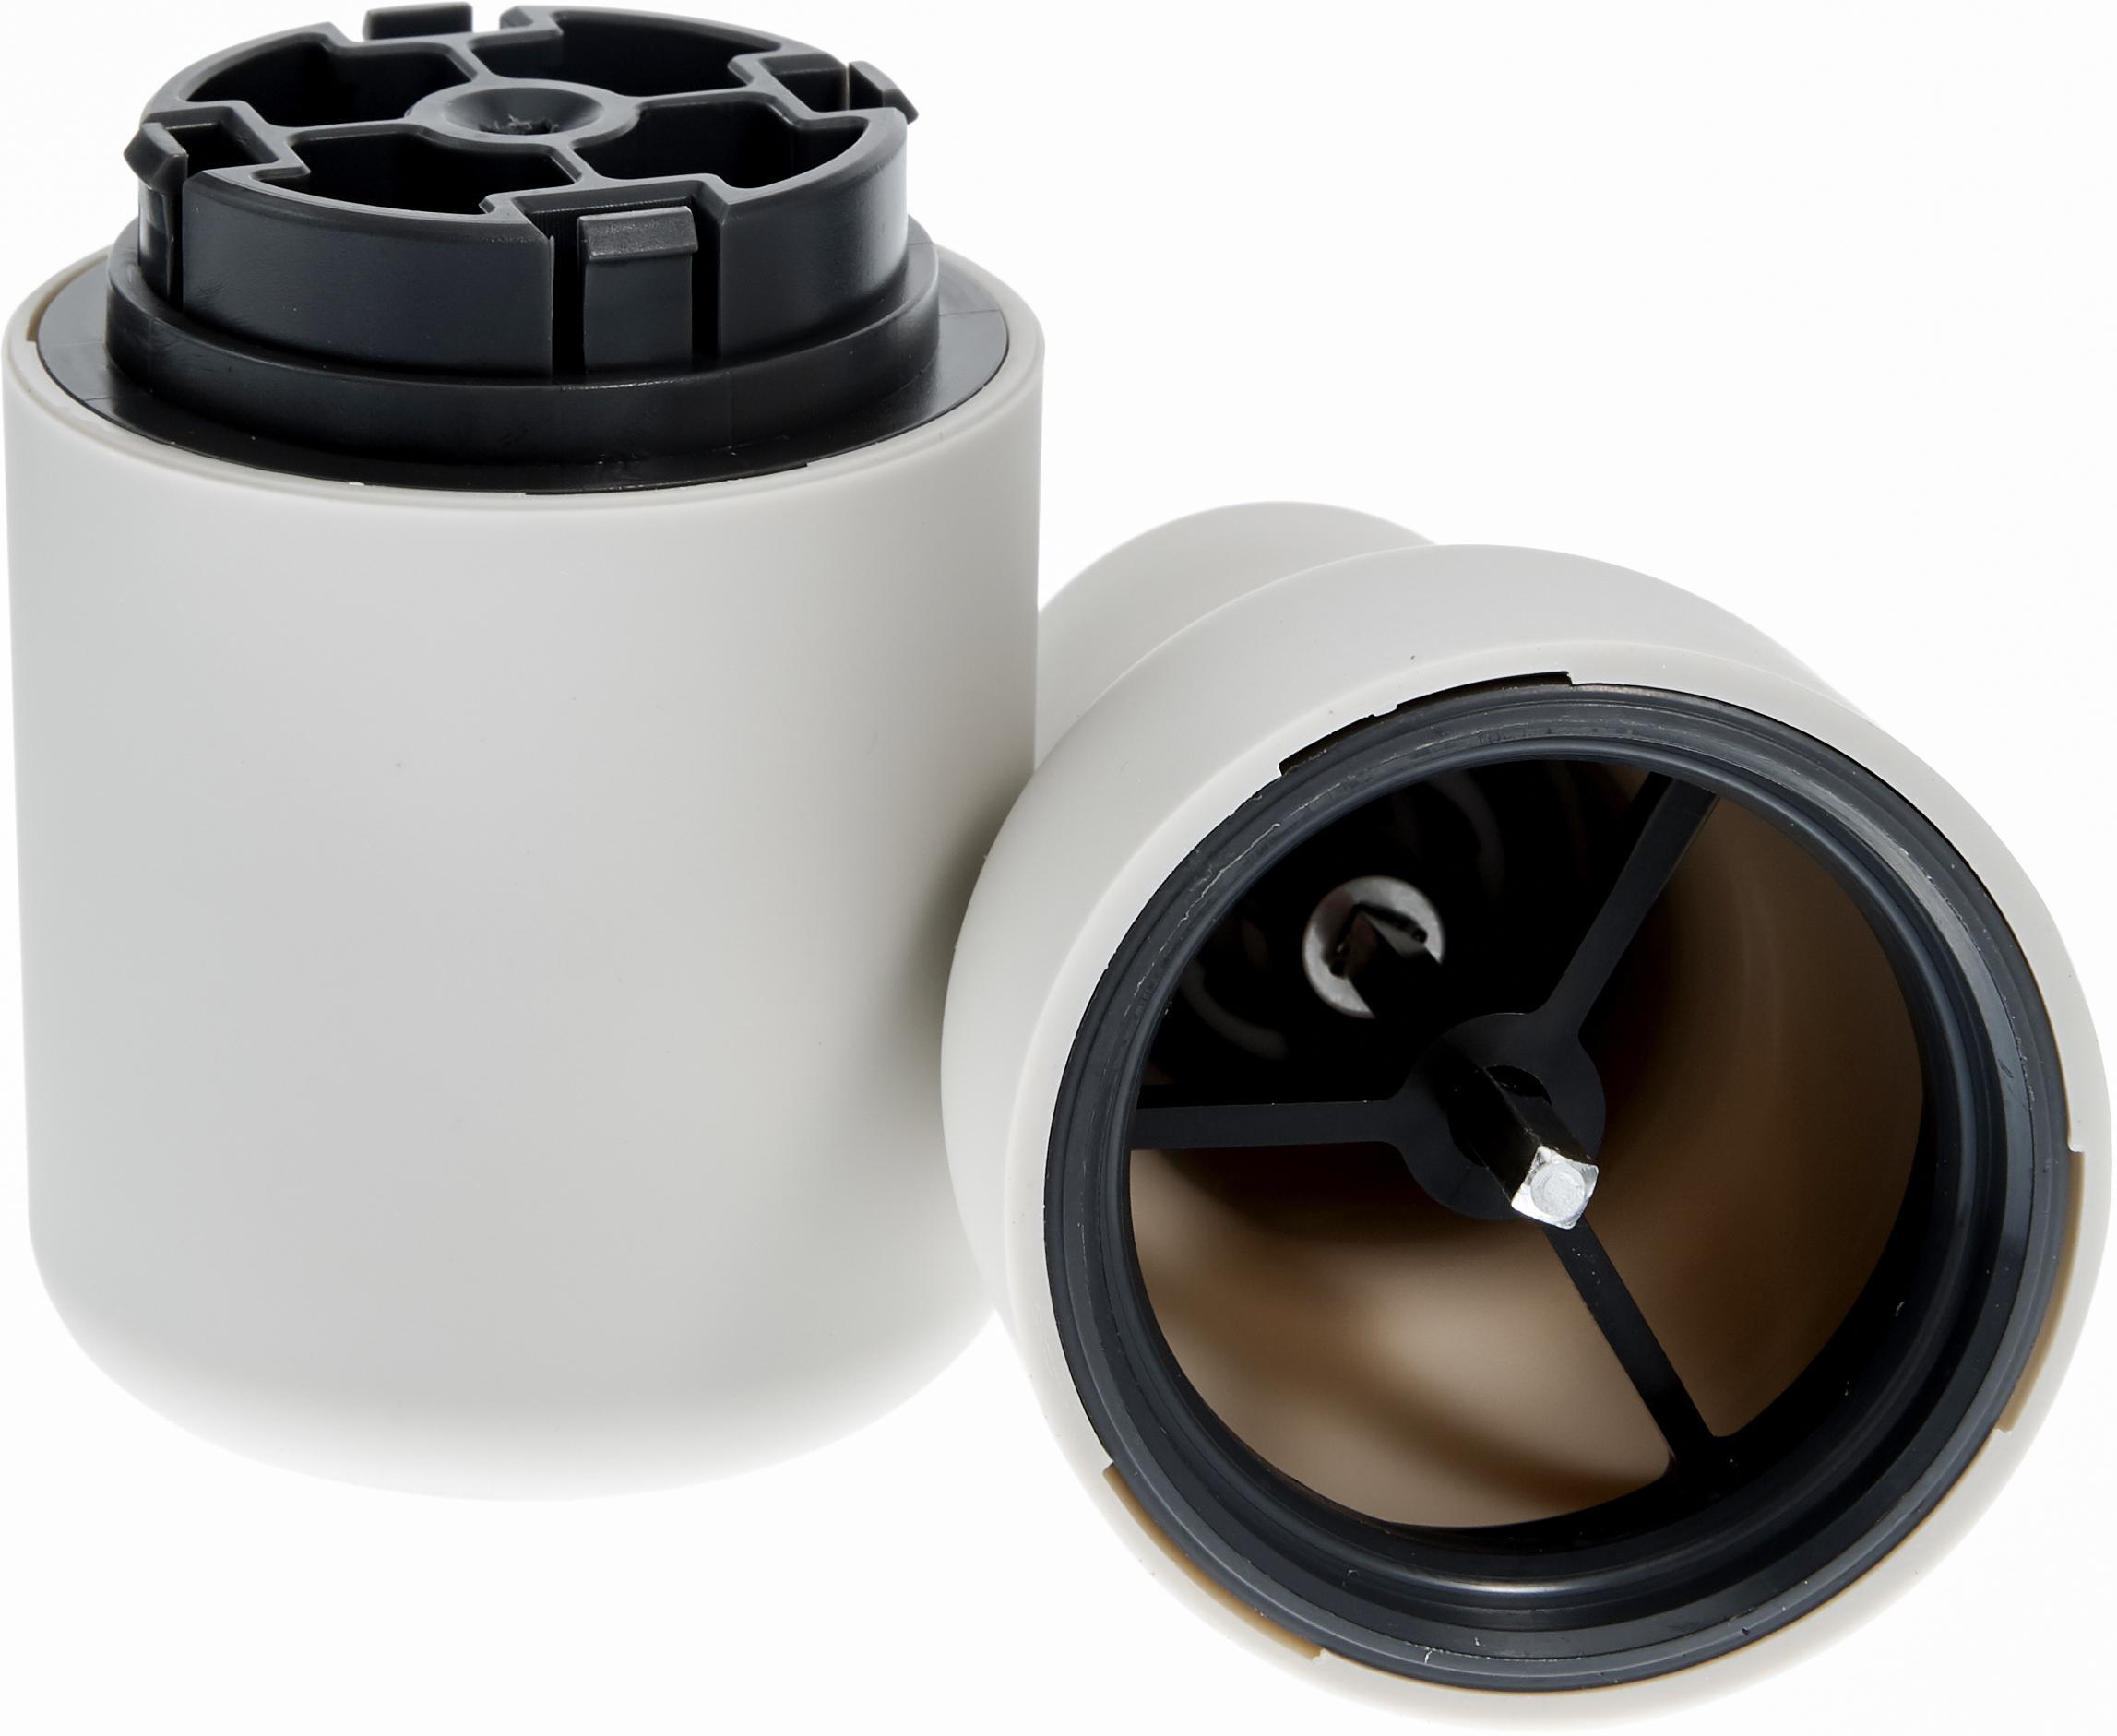 Peper- en zoutmolen Bottle Grinder, 2-delig, Frame: kunststof, Deksel: edelstaal, Antraciet, lichtgrijs, Ø 8 x H 21 cm